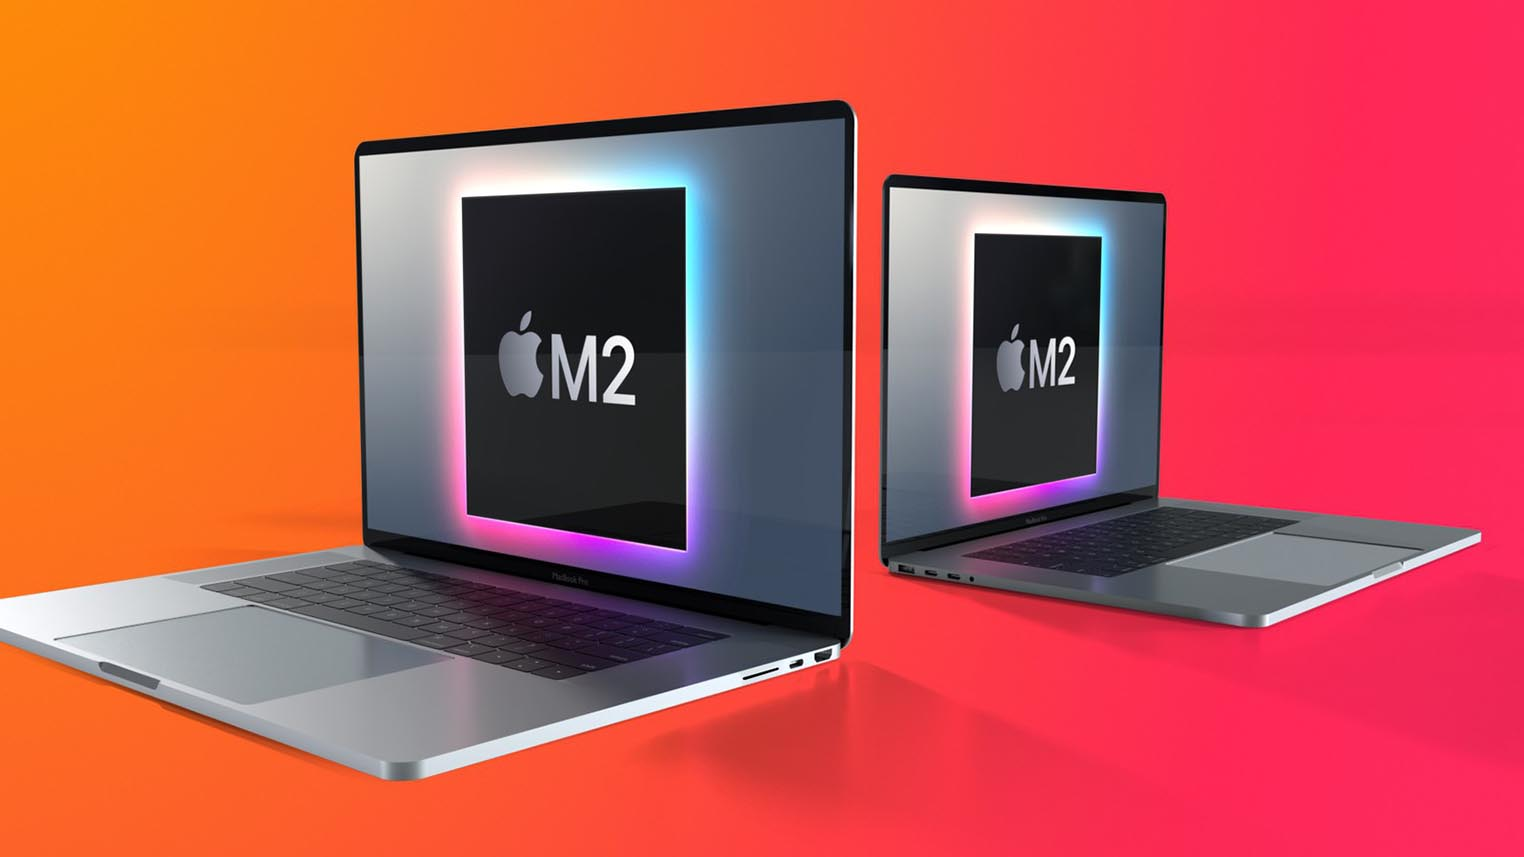 MacBook Pro M2 concept